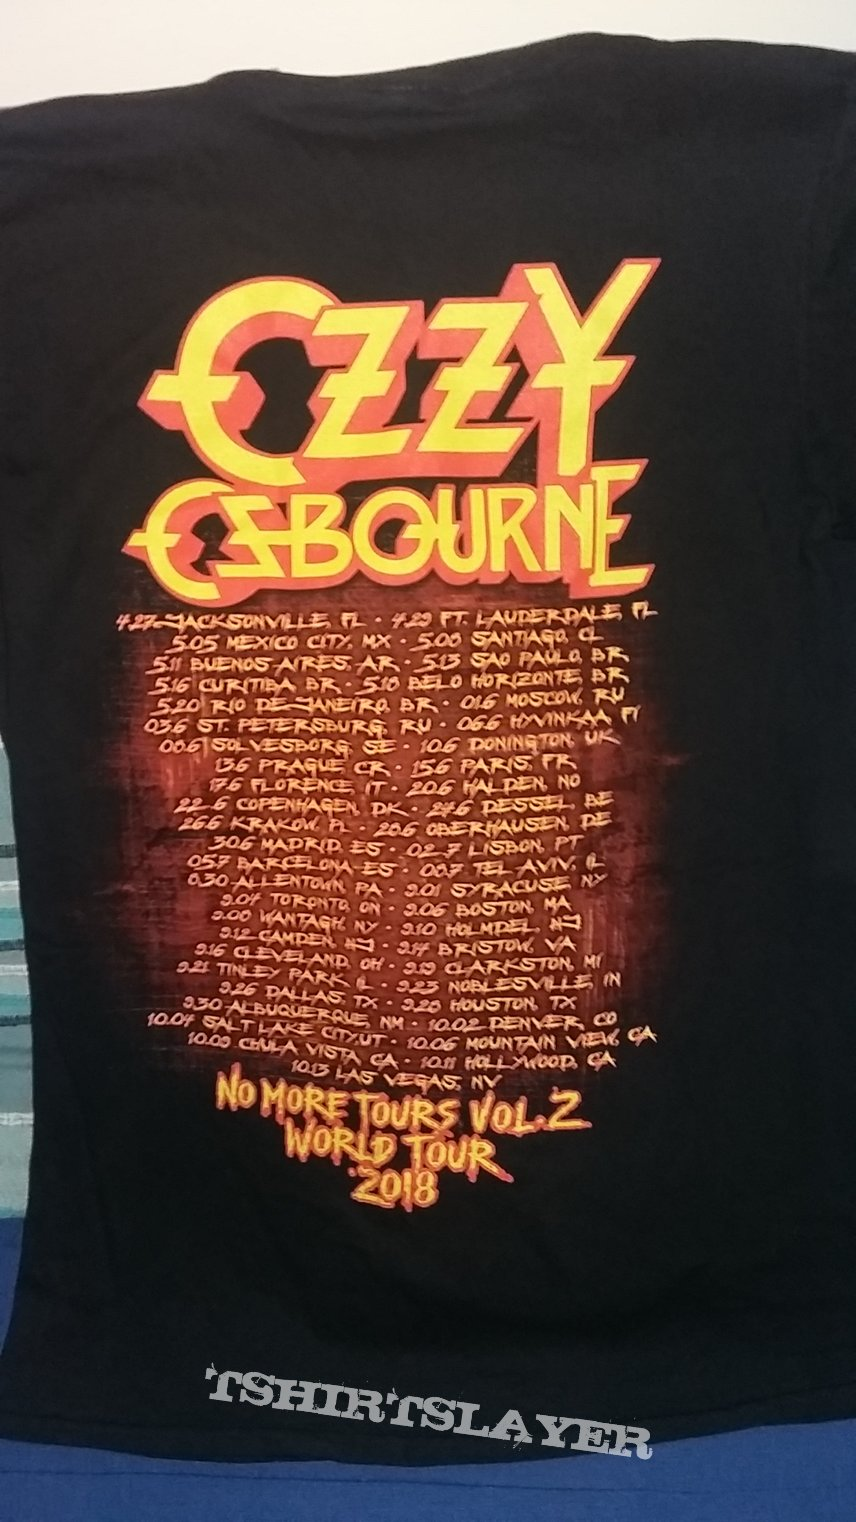 Ozzy Osbourne - No More Tours Vol.2 World Tour 2018